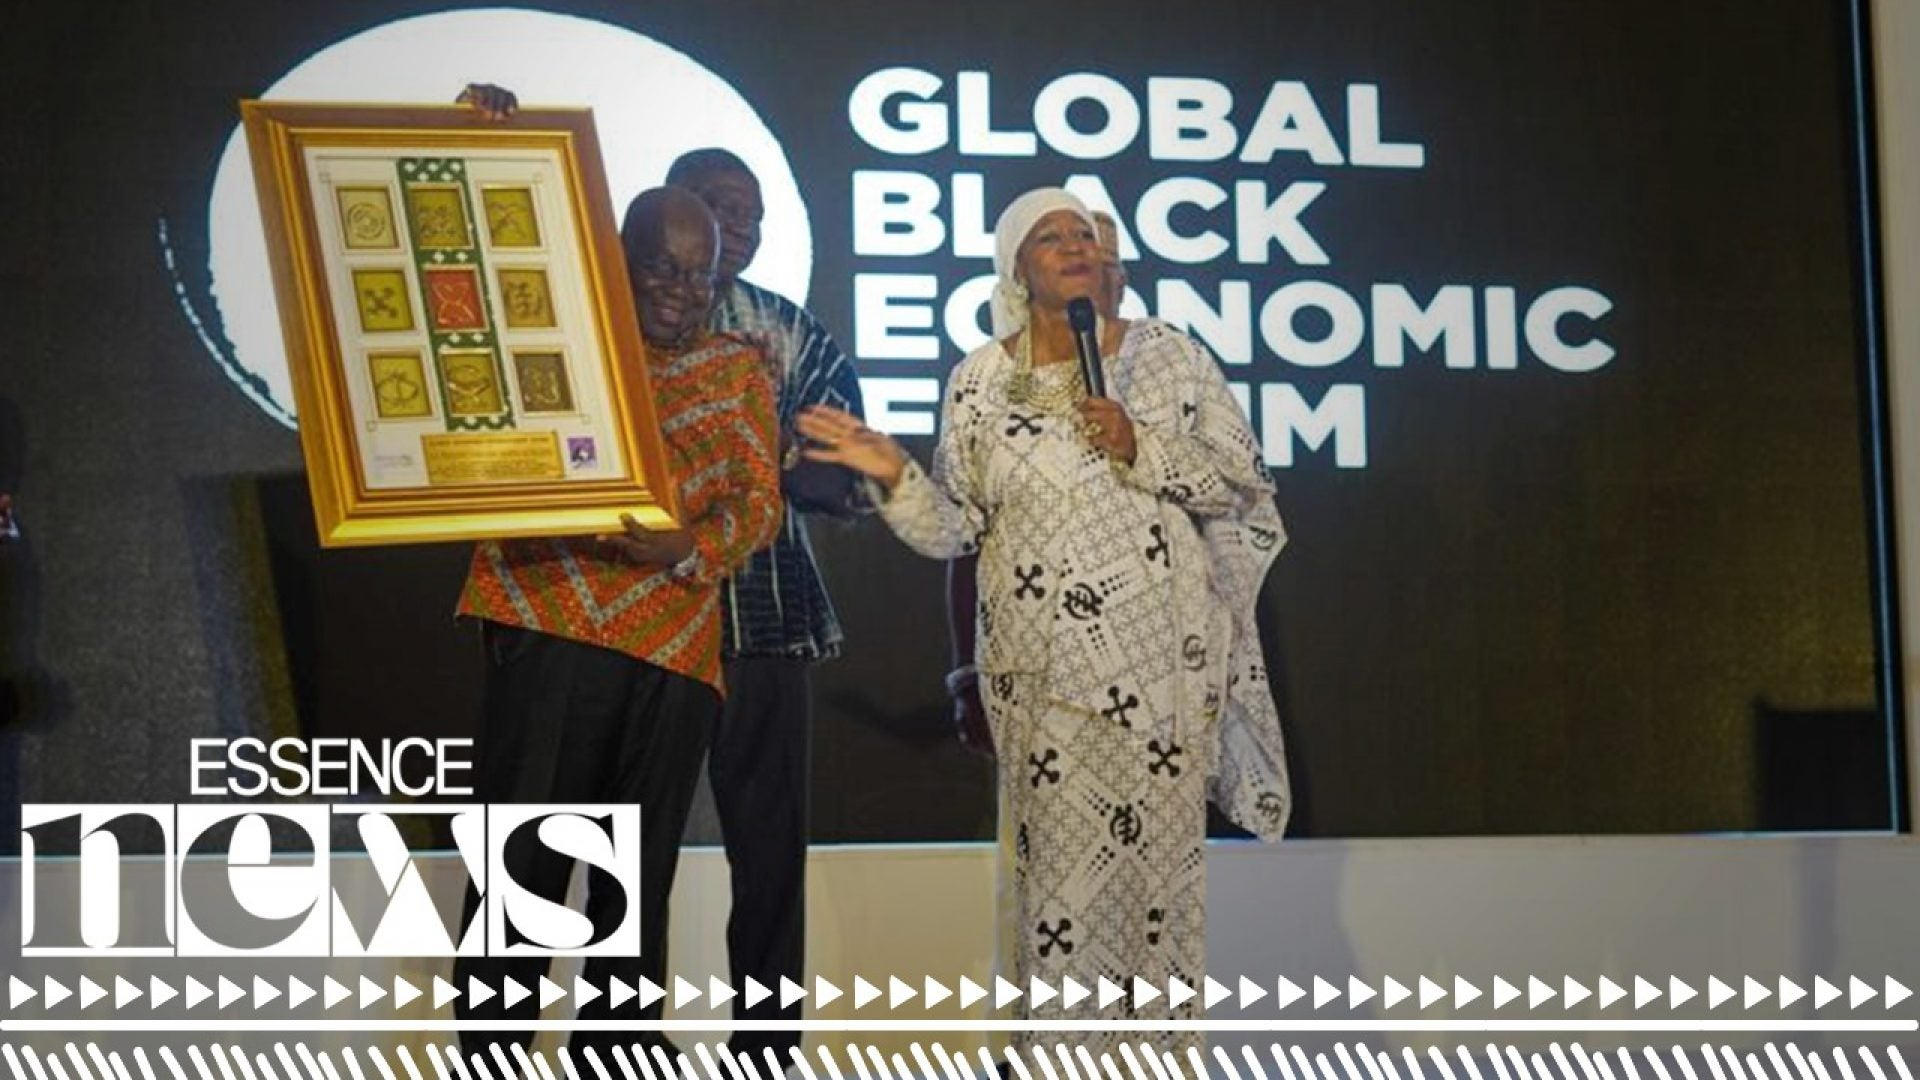 ESSENCE Global Black Economic Forum – Africa